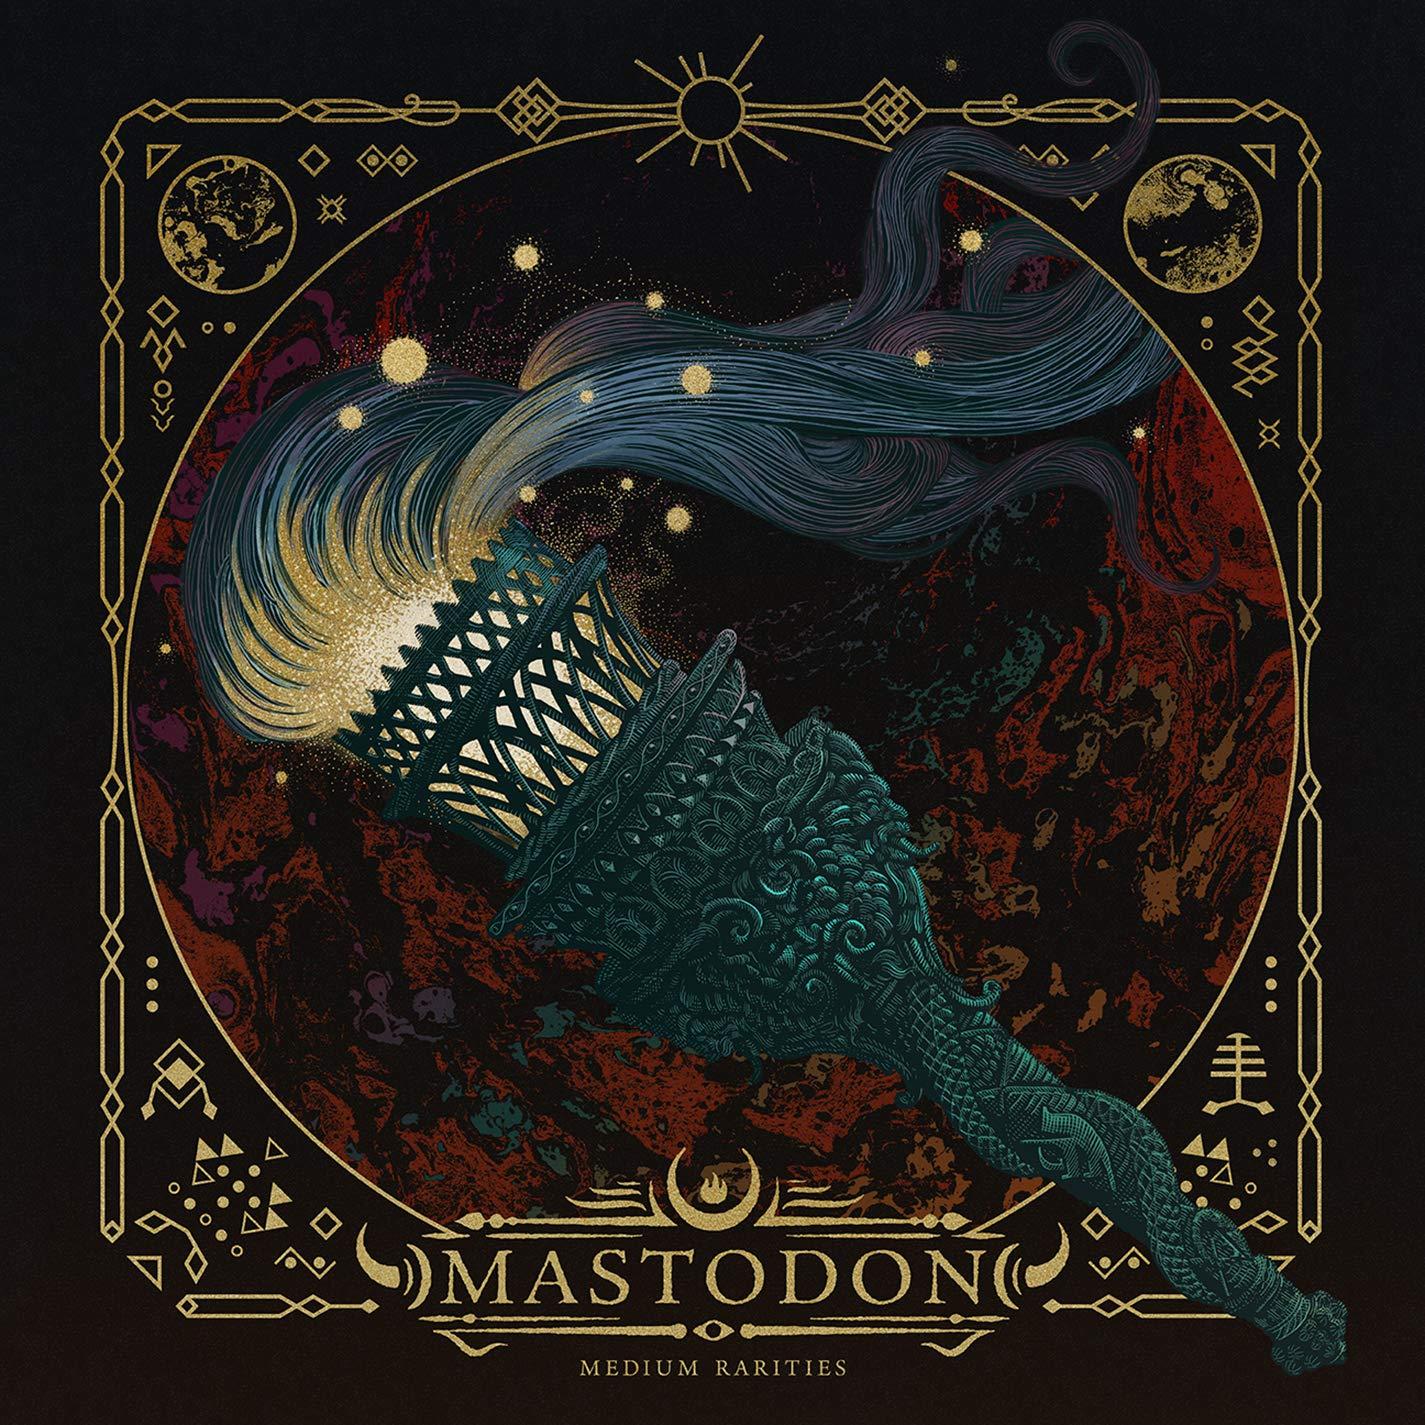 Mastodon Medium Rarities